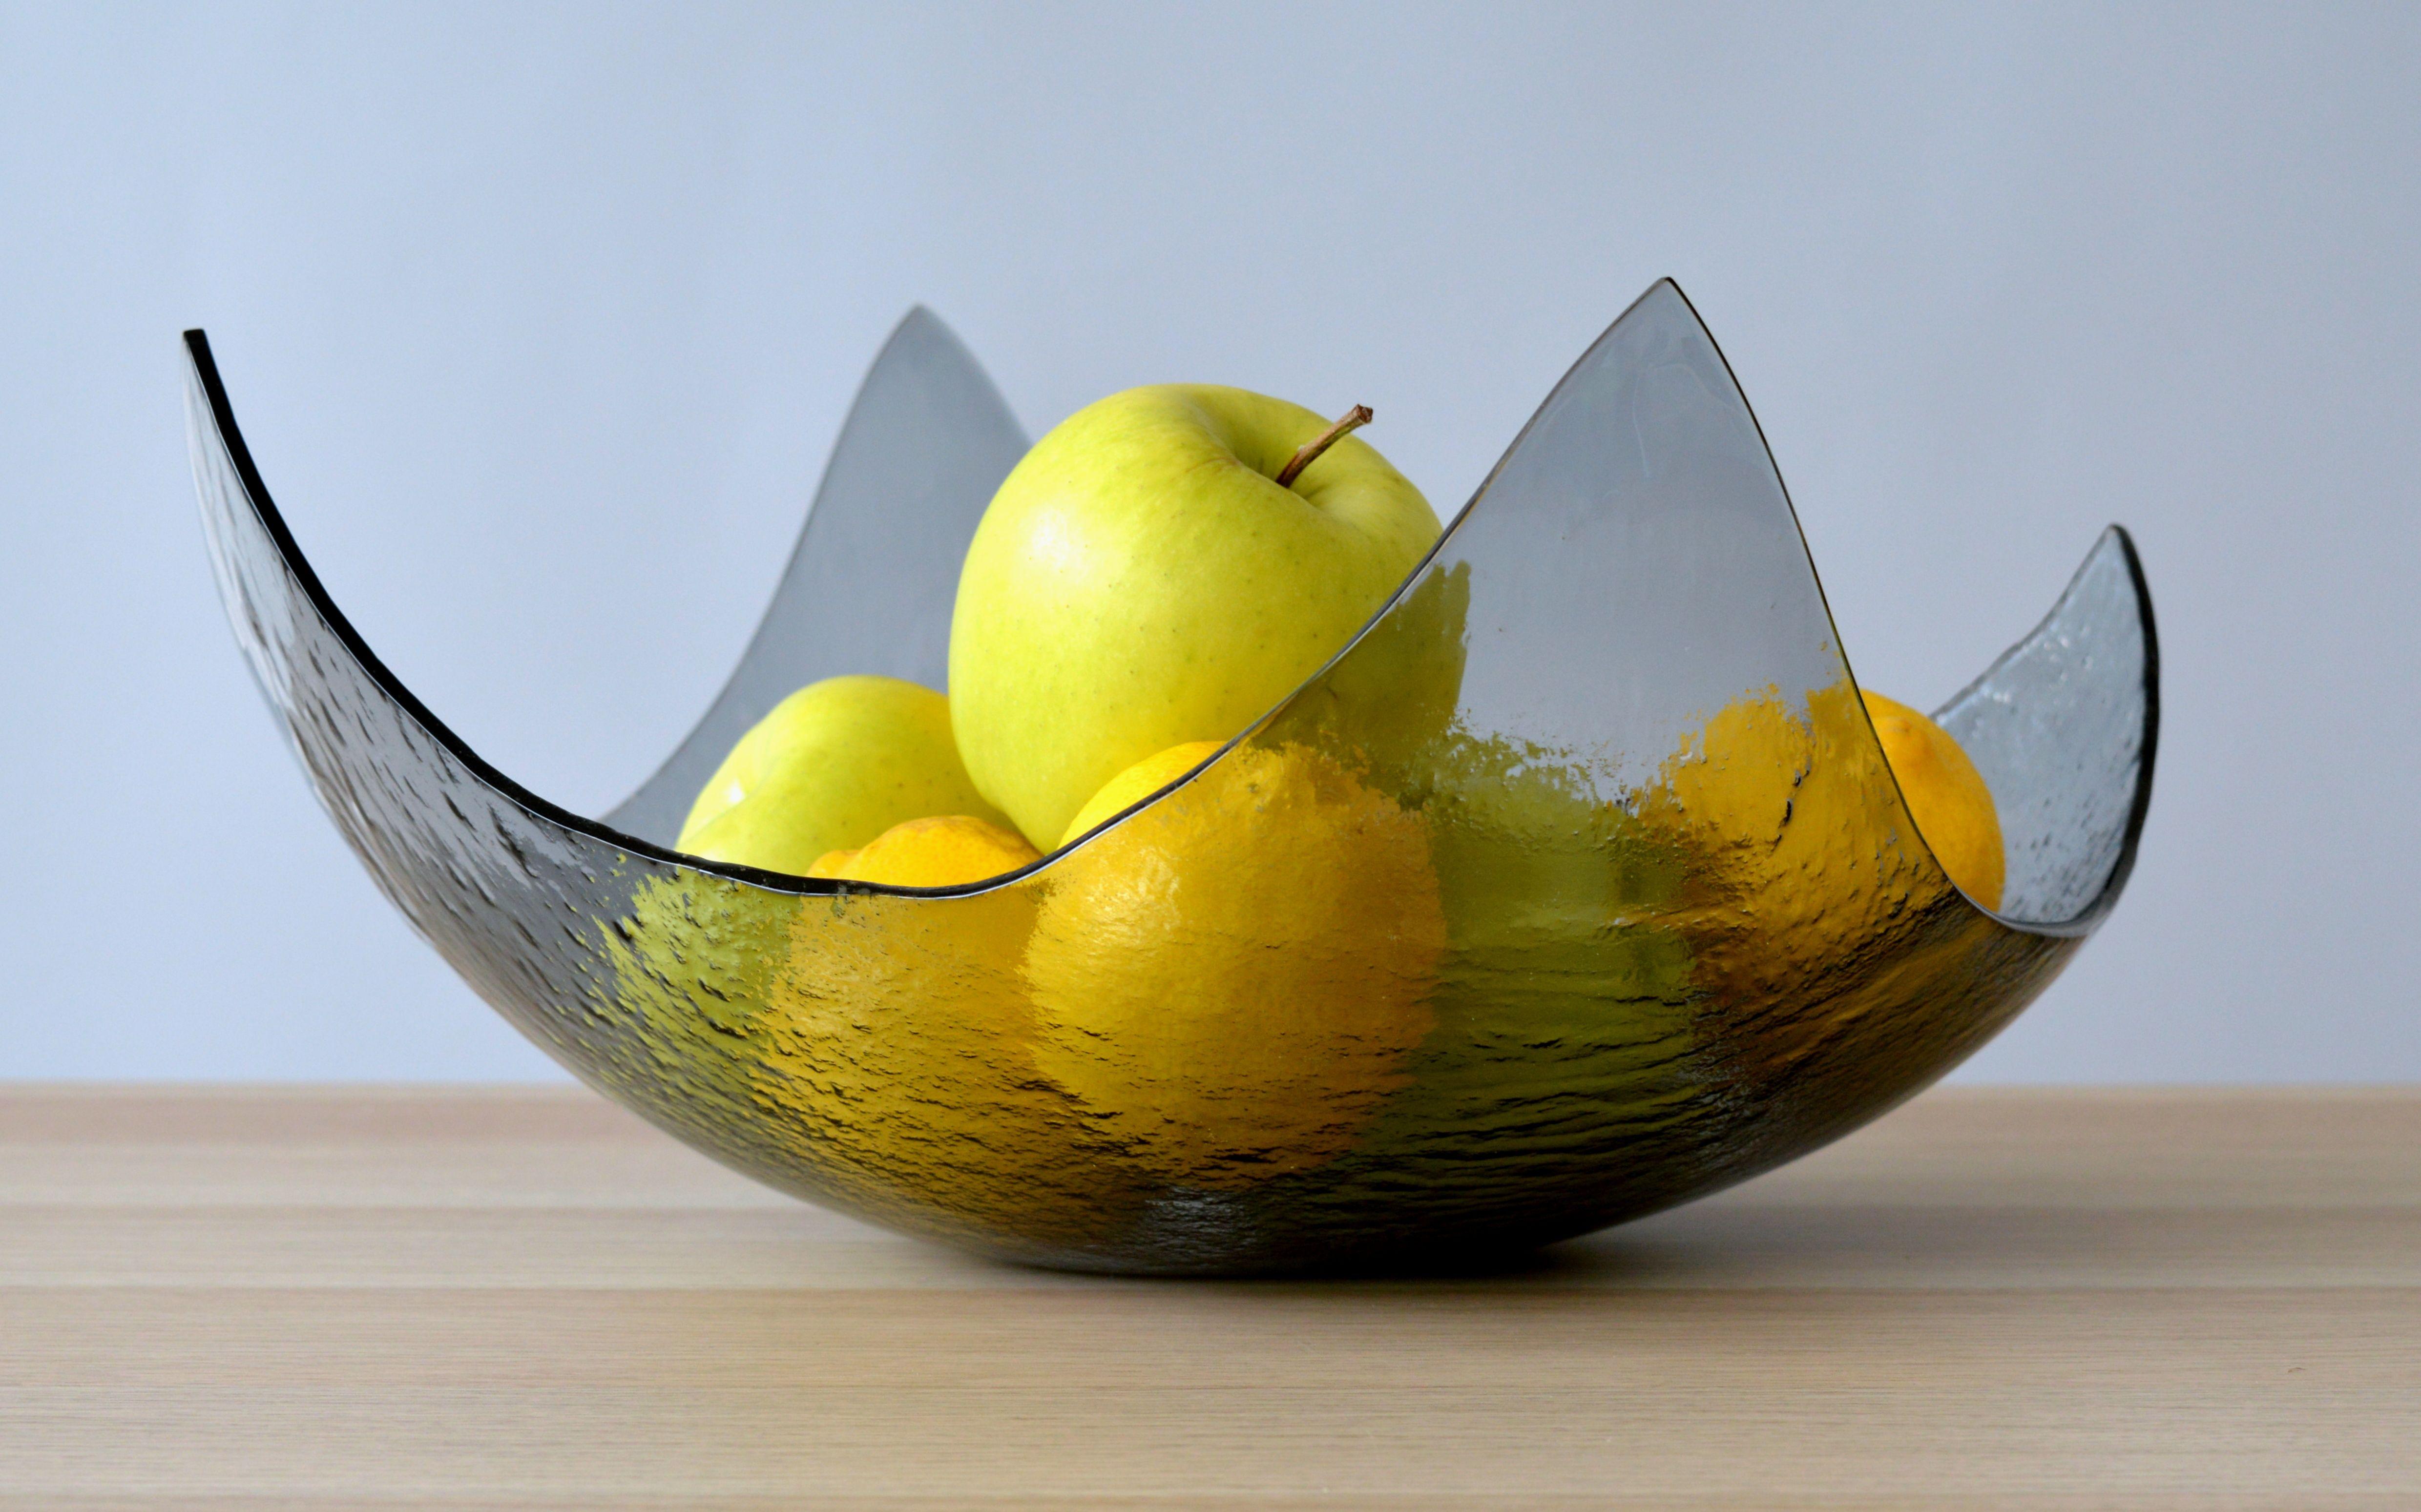 Modern Minimalist Fused Glass Fruit Bowl Centerpiece Salad Etsy Fused Glass Bowl Glass Fruit Bowl Glass Bowl